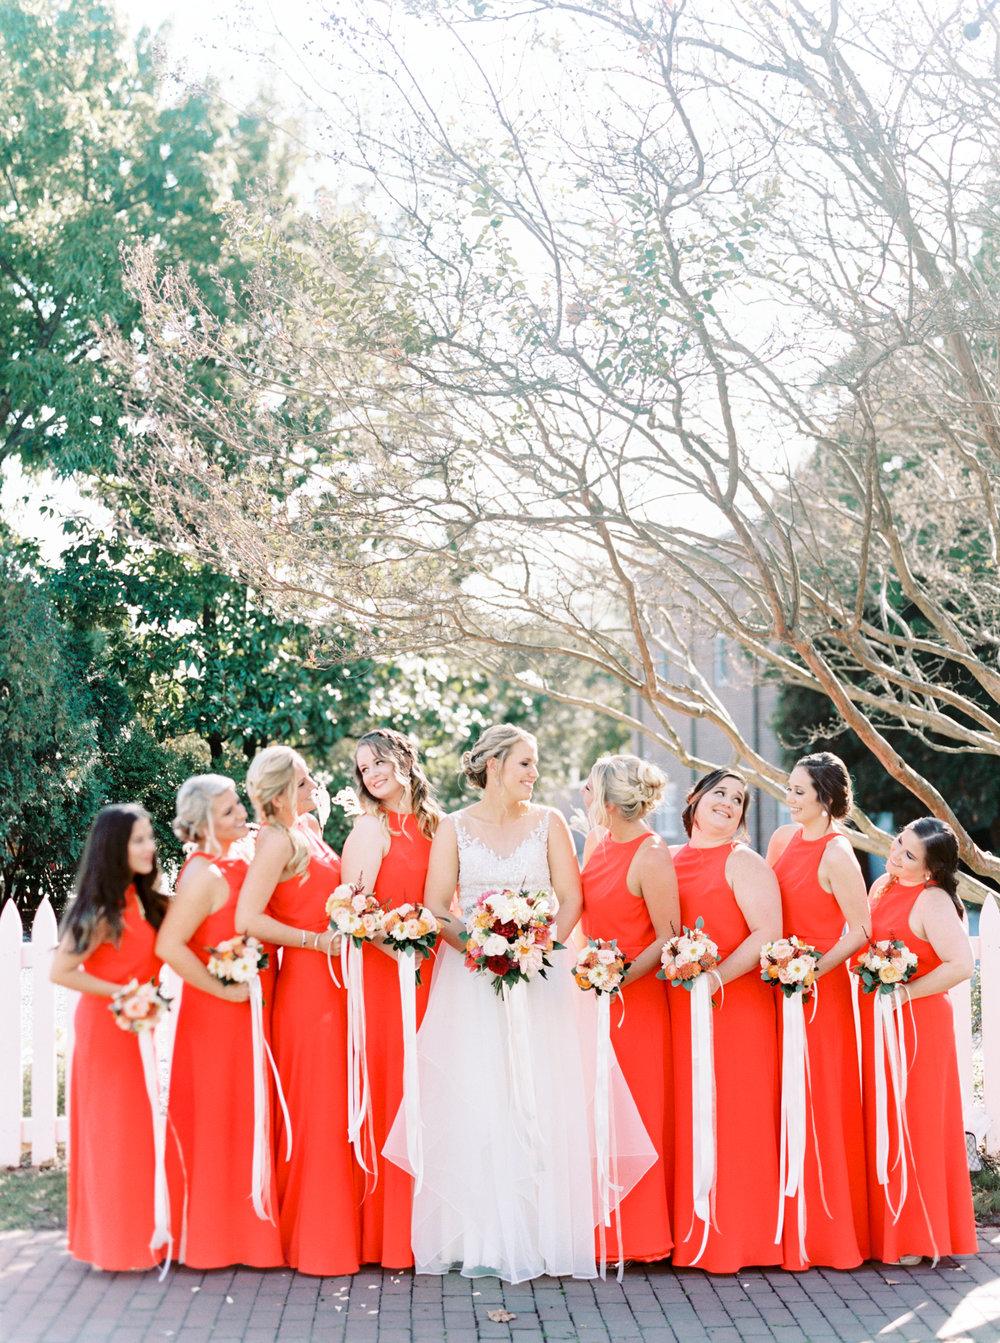 Easton_Maryland-fall-backyard-wedding-photographer-Richmond-natalie-jayne-photography-image-03.jpg